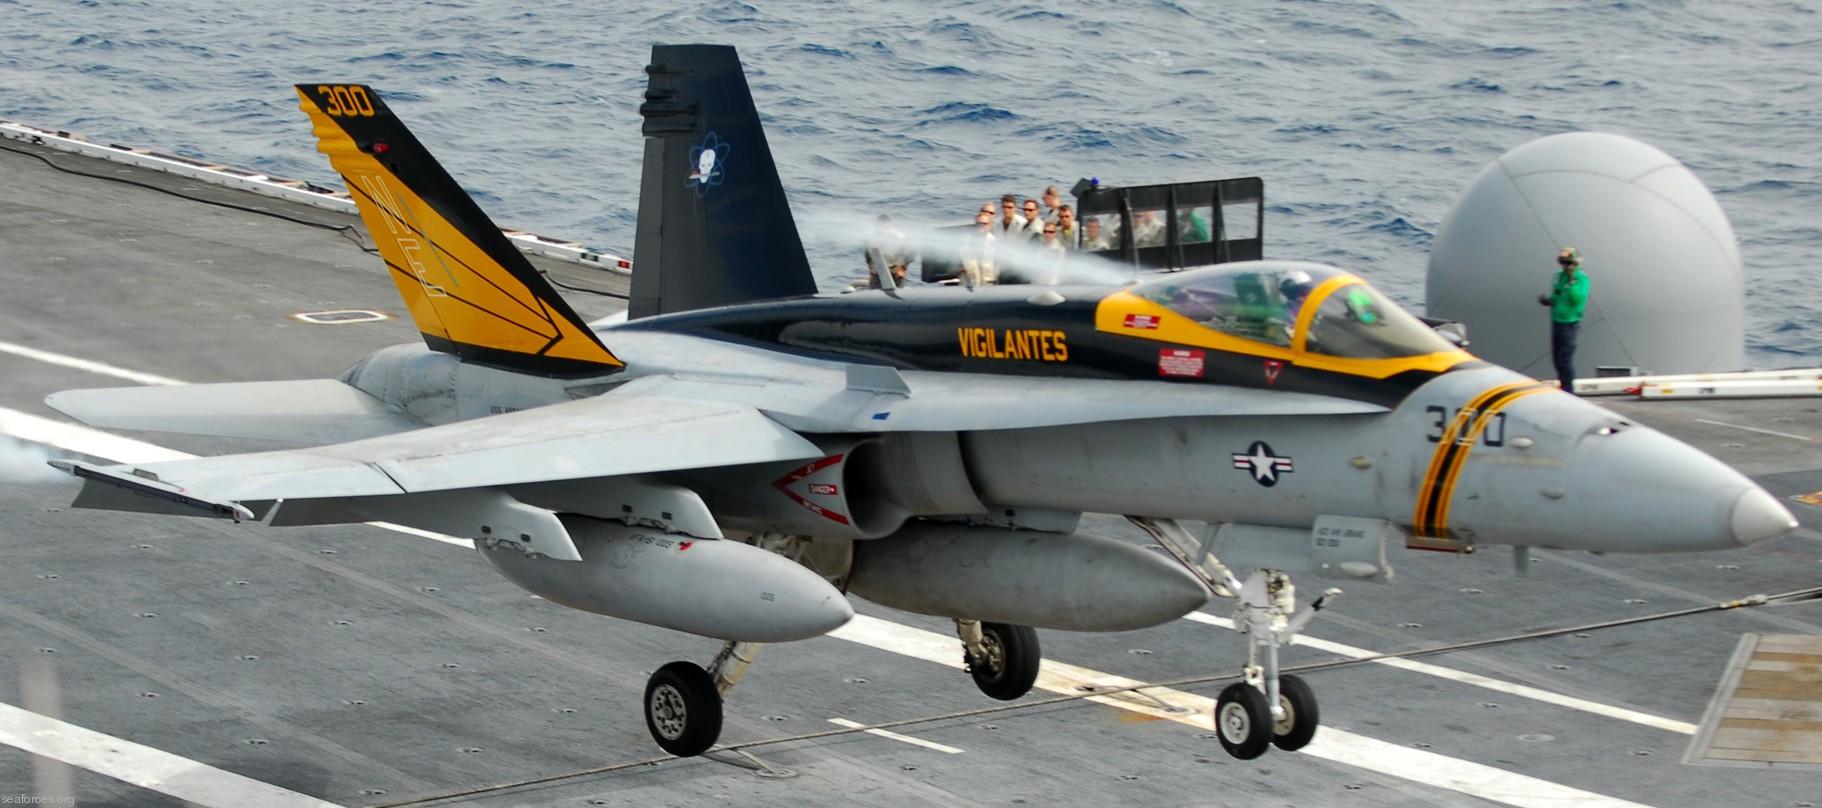 VFA-151-Vigilantes-048.jpg